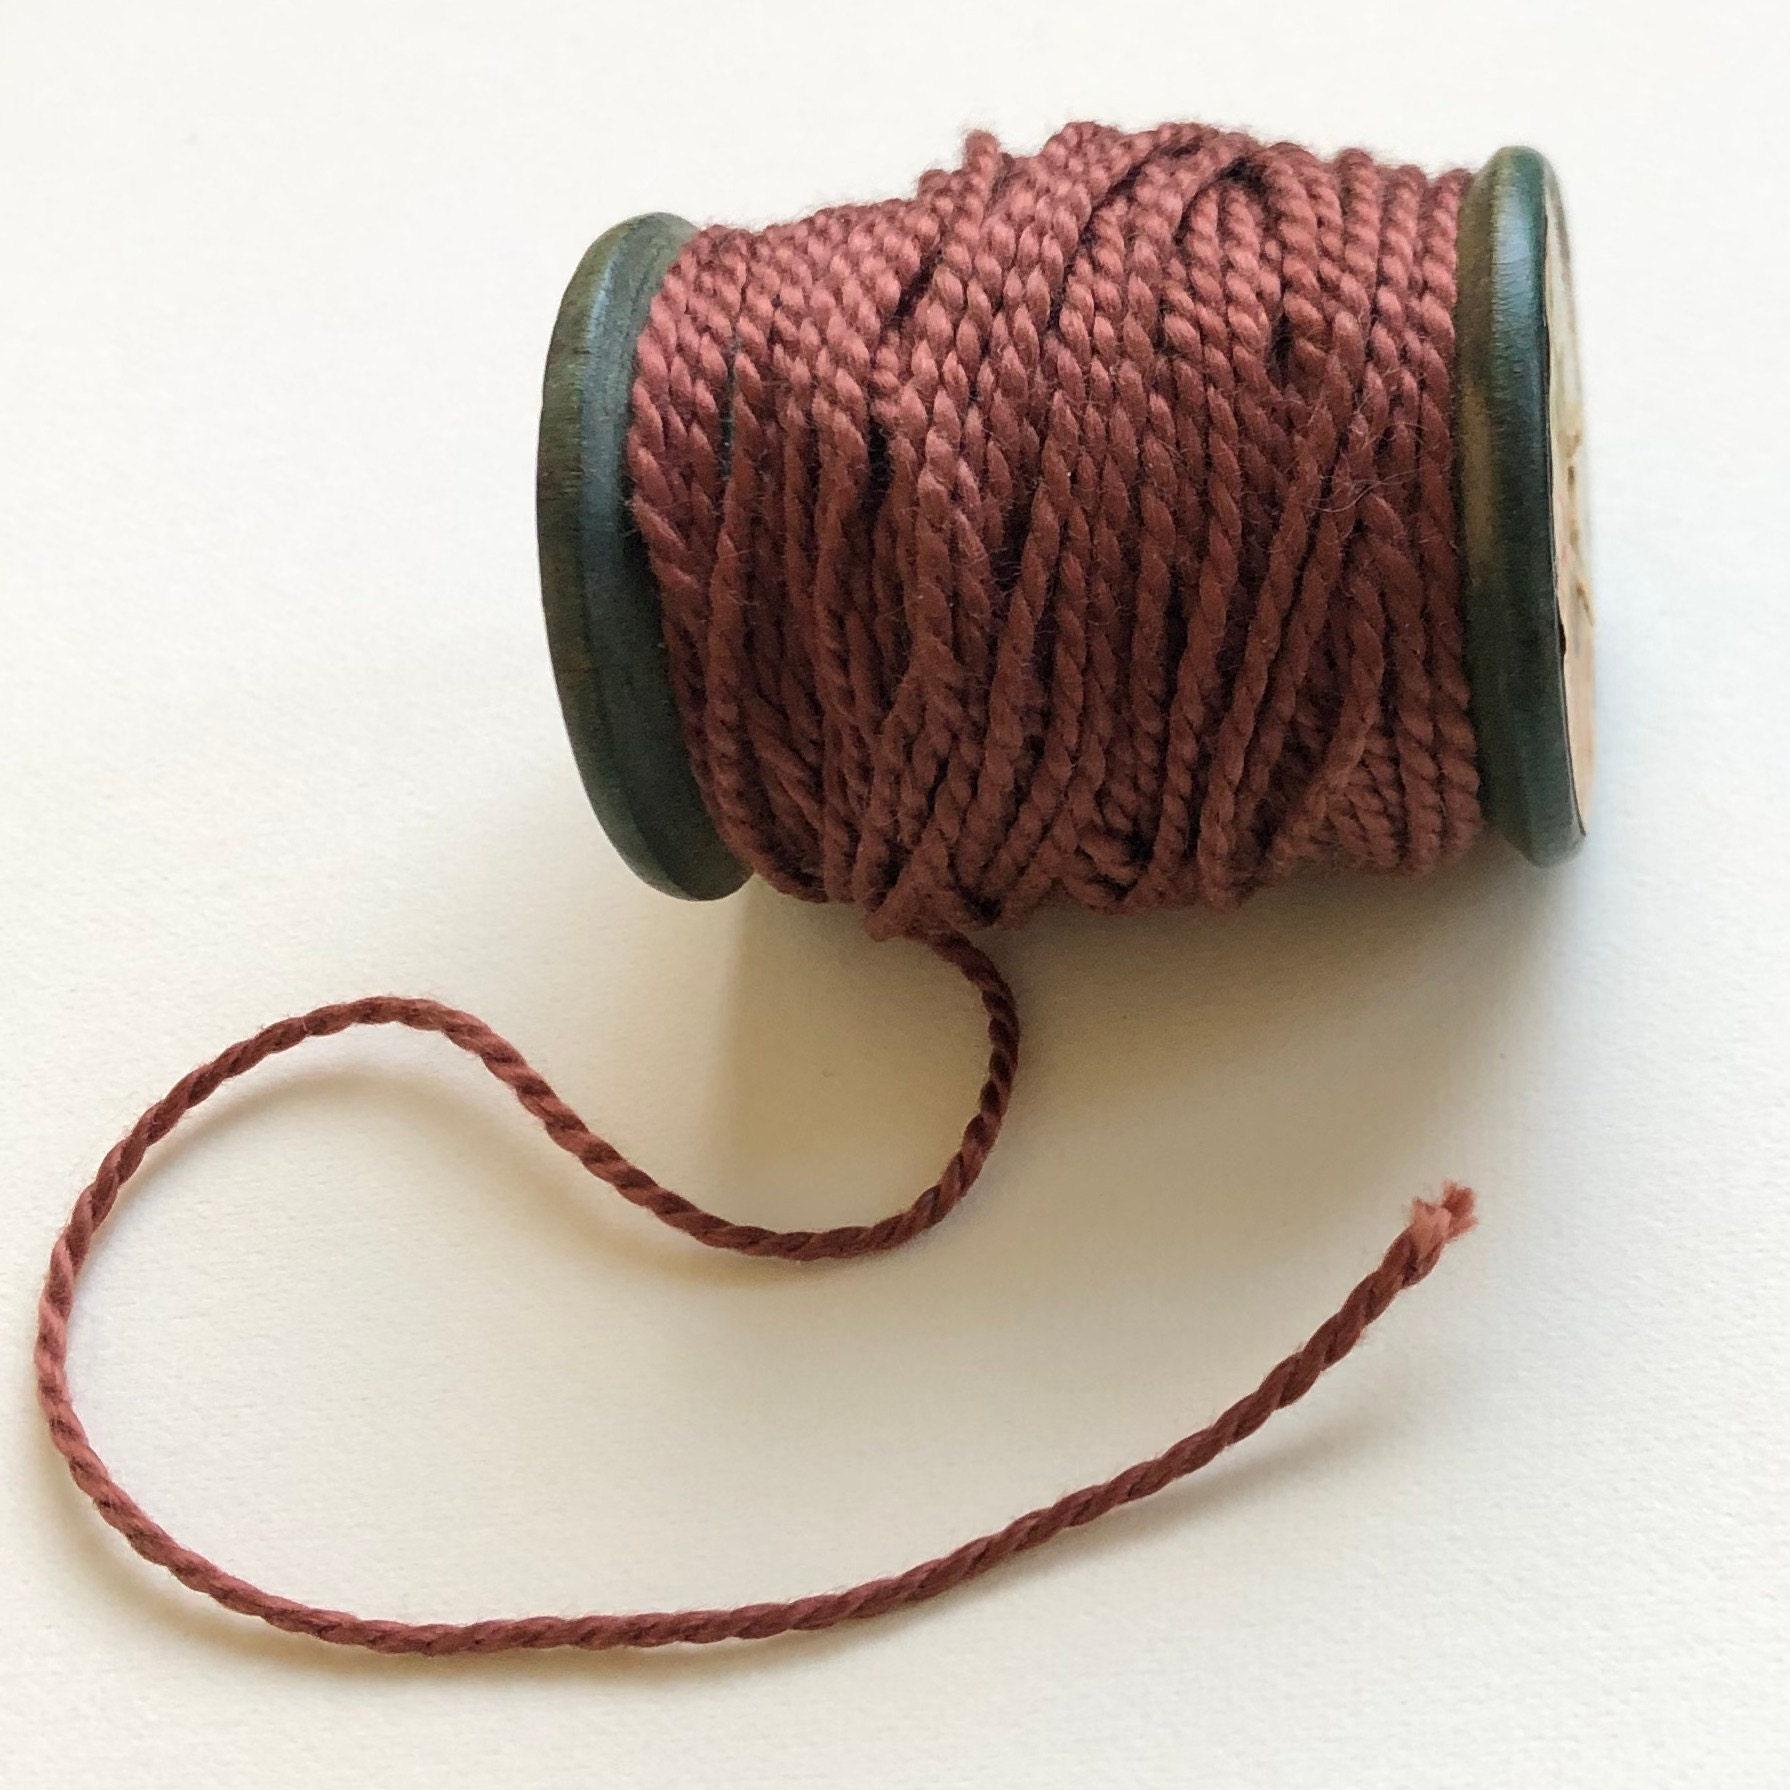 Flos crewel thread